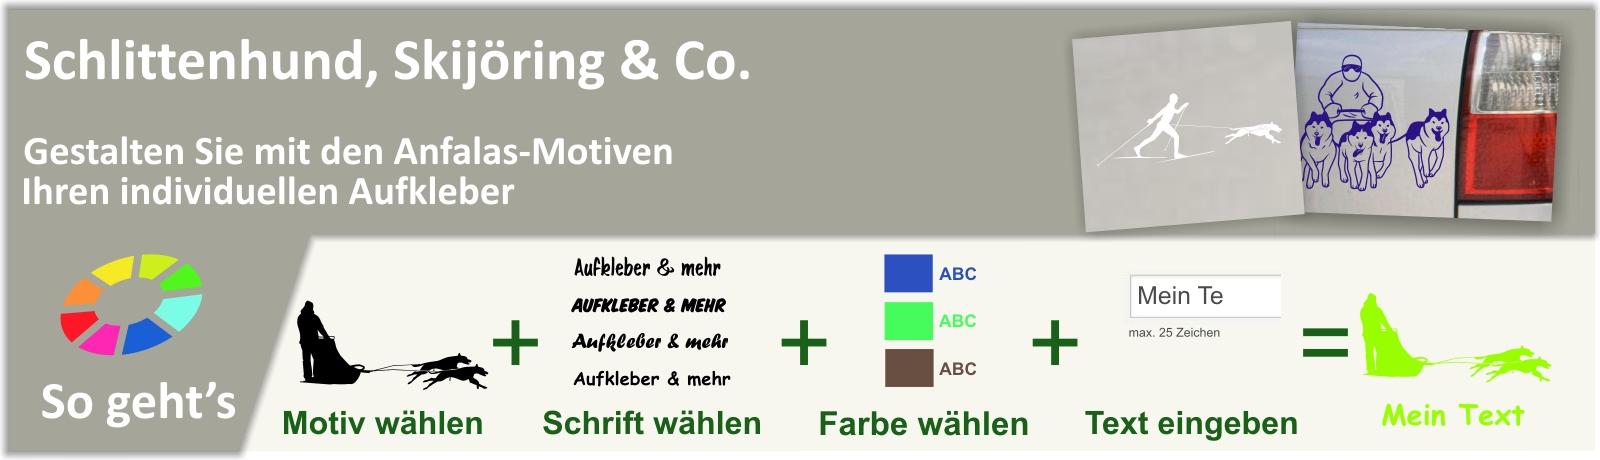 Schlittenhund, Skijöring & Co.